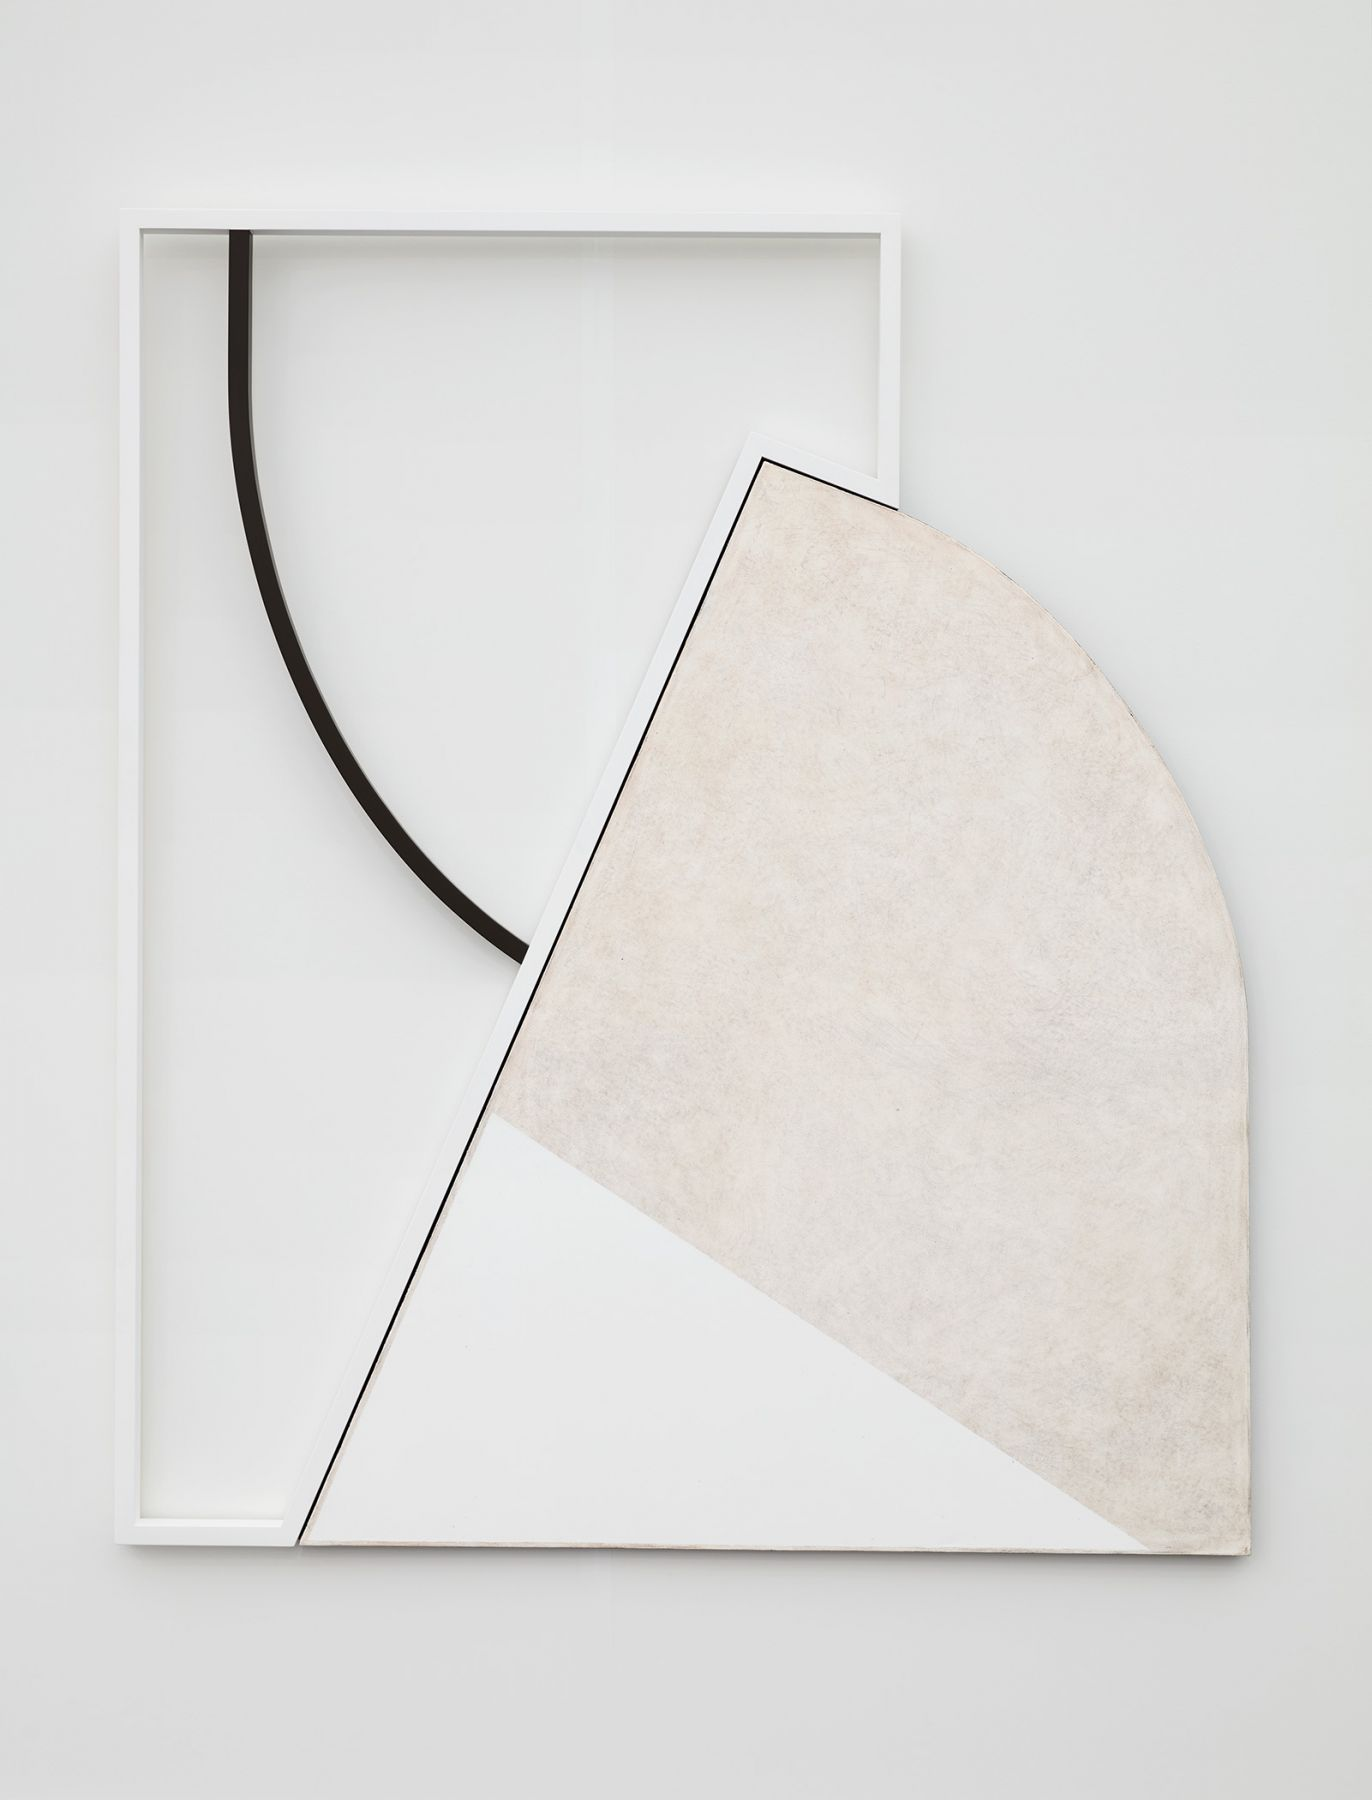 A minimal white painting by Svenja Deininger